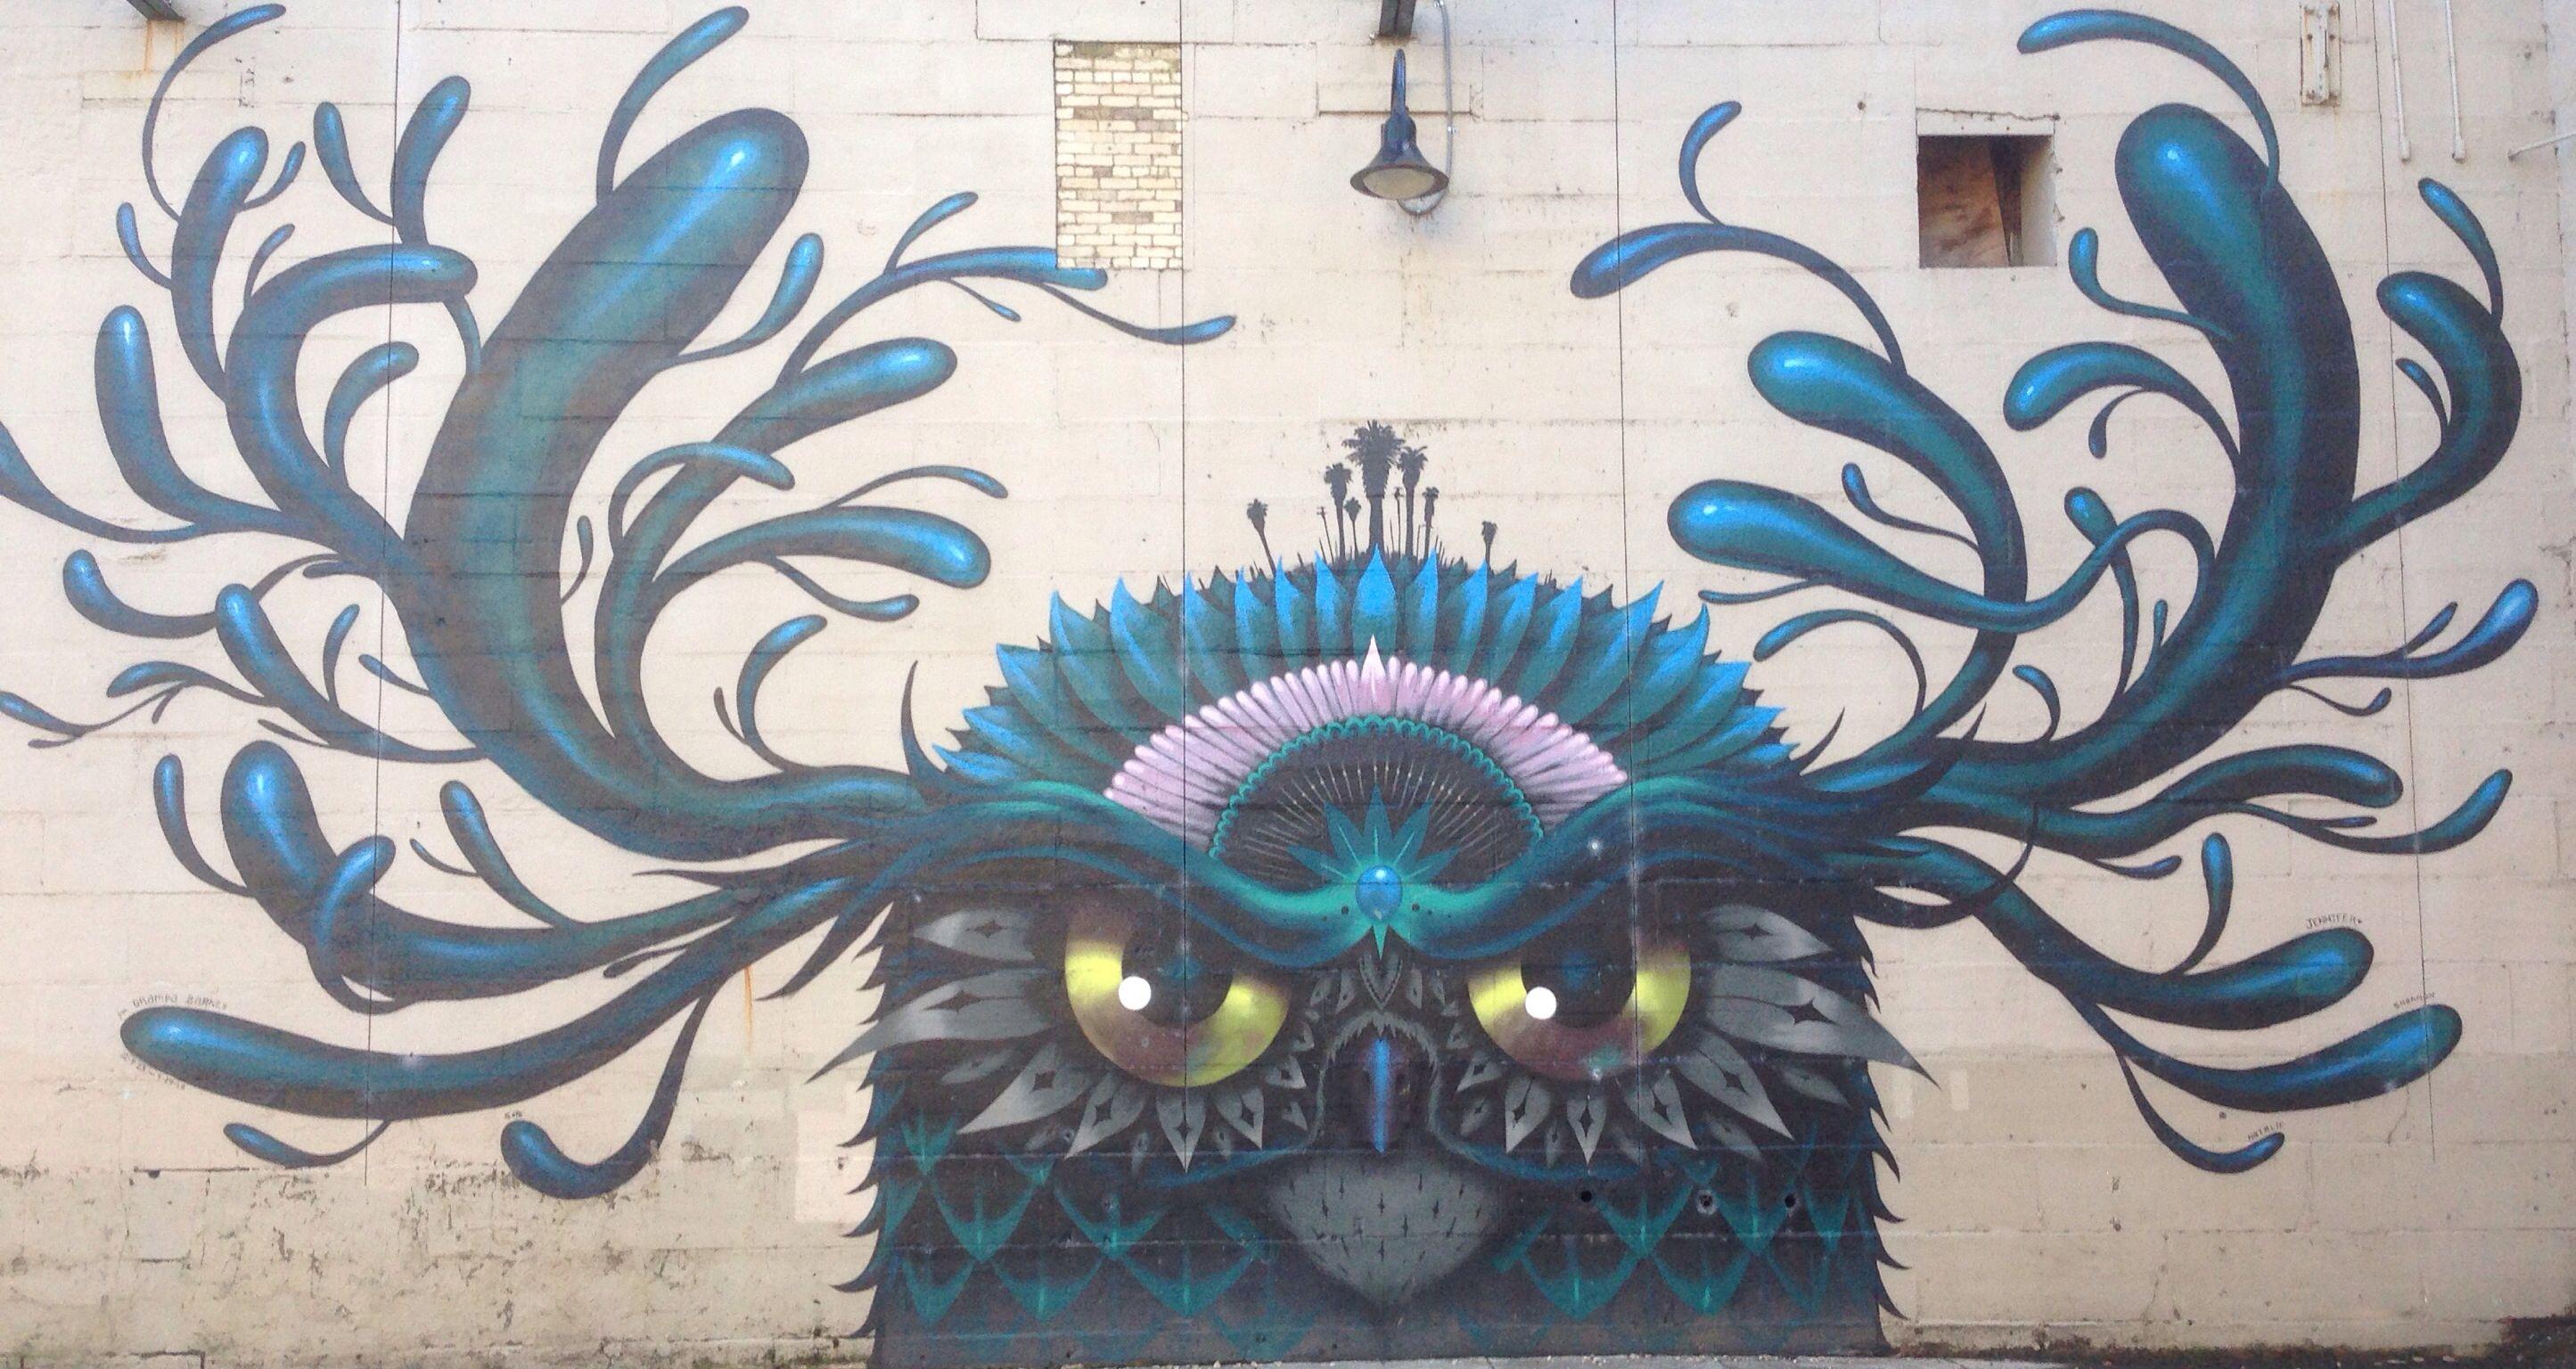 Richmond va graffiti 1 | Cool pics | Pinterest